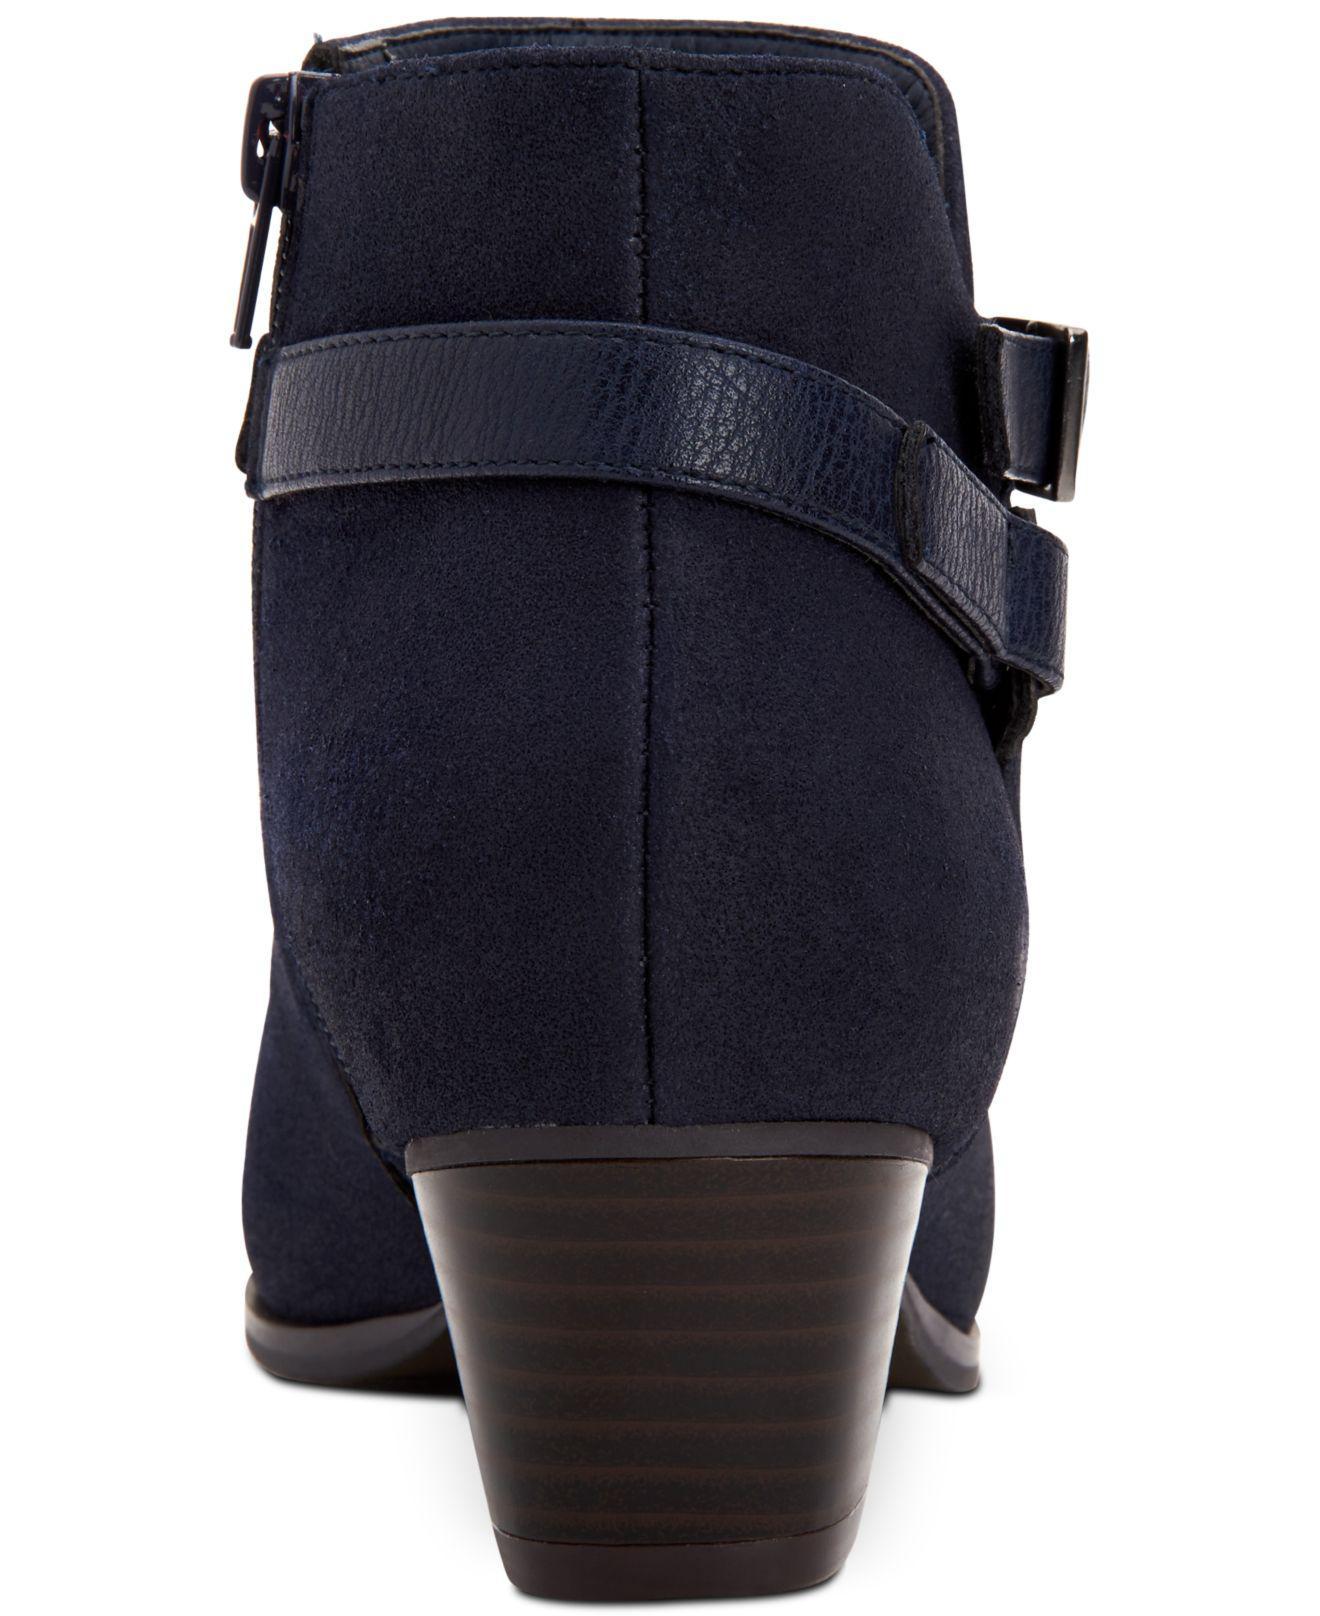 thumbnail 12 - Giani-Bernini-Womens-Dorii-Leather-Almond-Toe-Ankle-Fashion-Boots